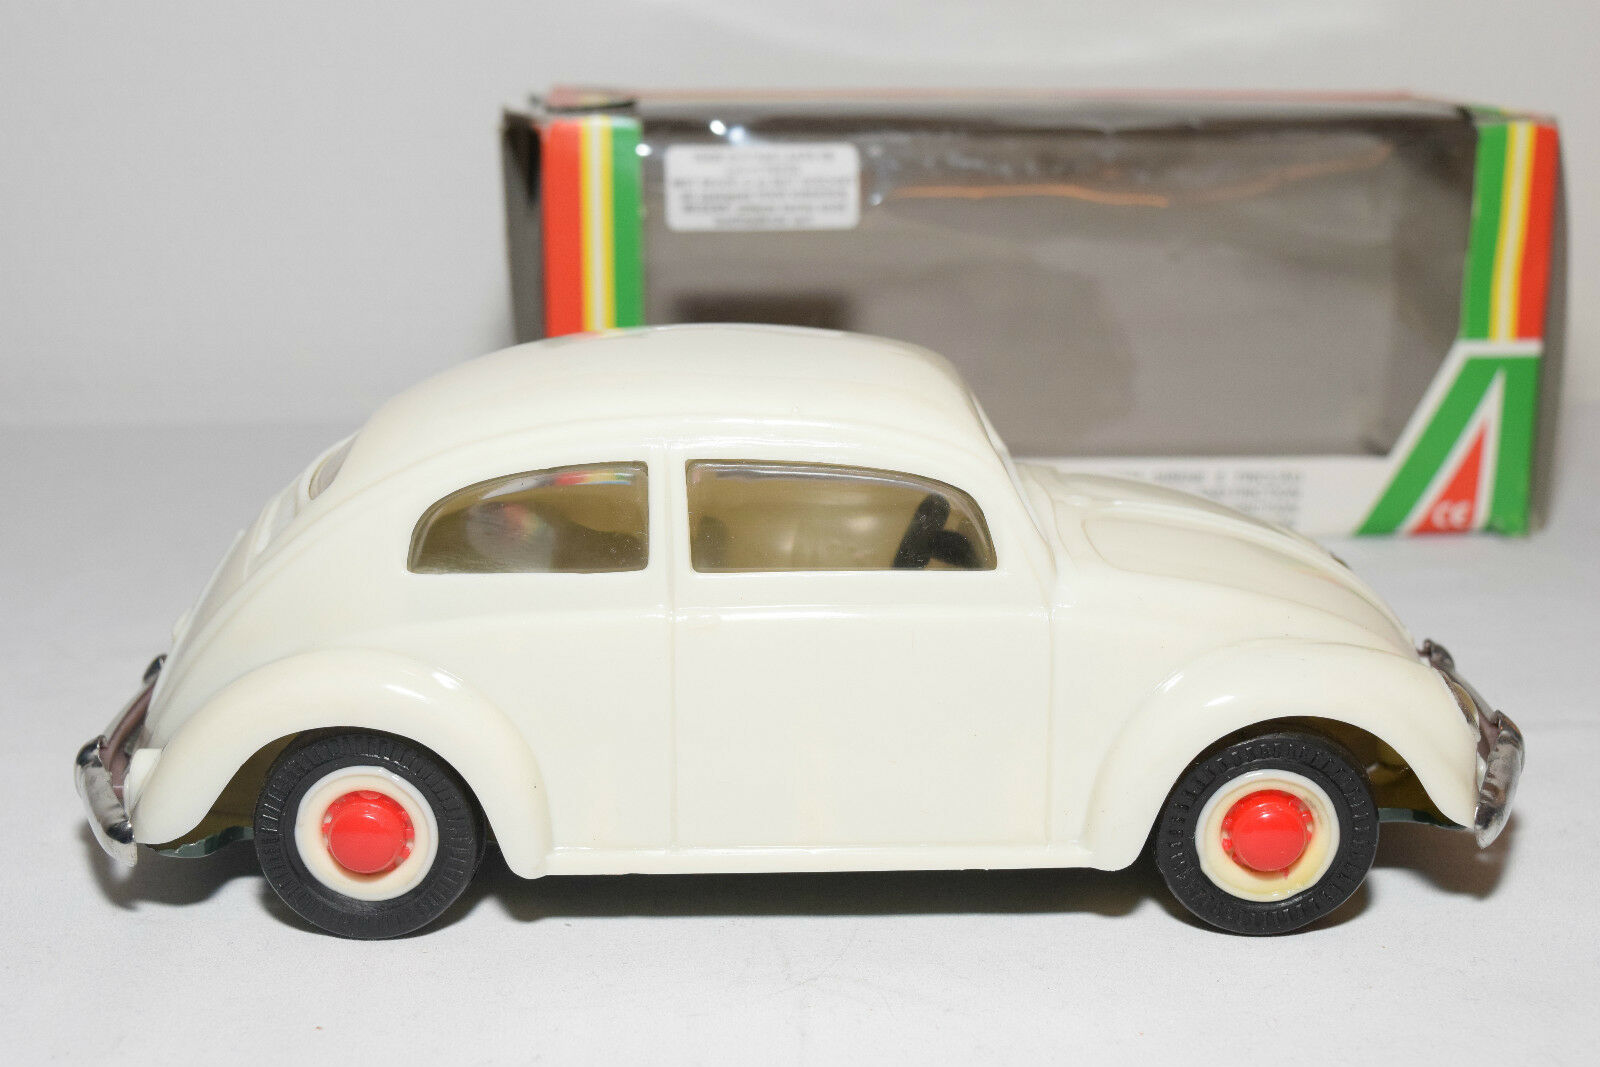 PEPE PORTUGAL PORTUGAL PORTUGAL PLASTIC VW VOLKSWAGEN BEETLE KAFER WHITE NEAR MINT BOXED 410026